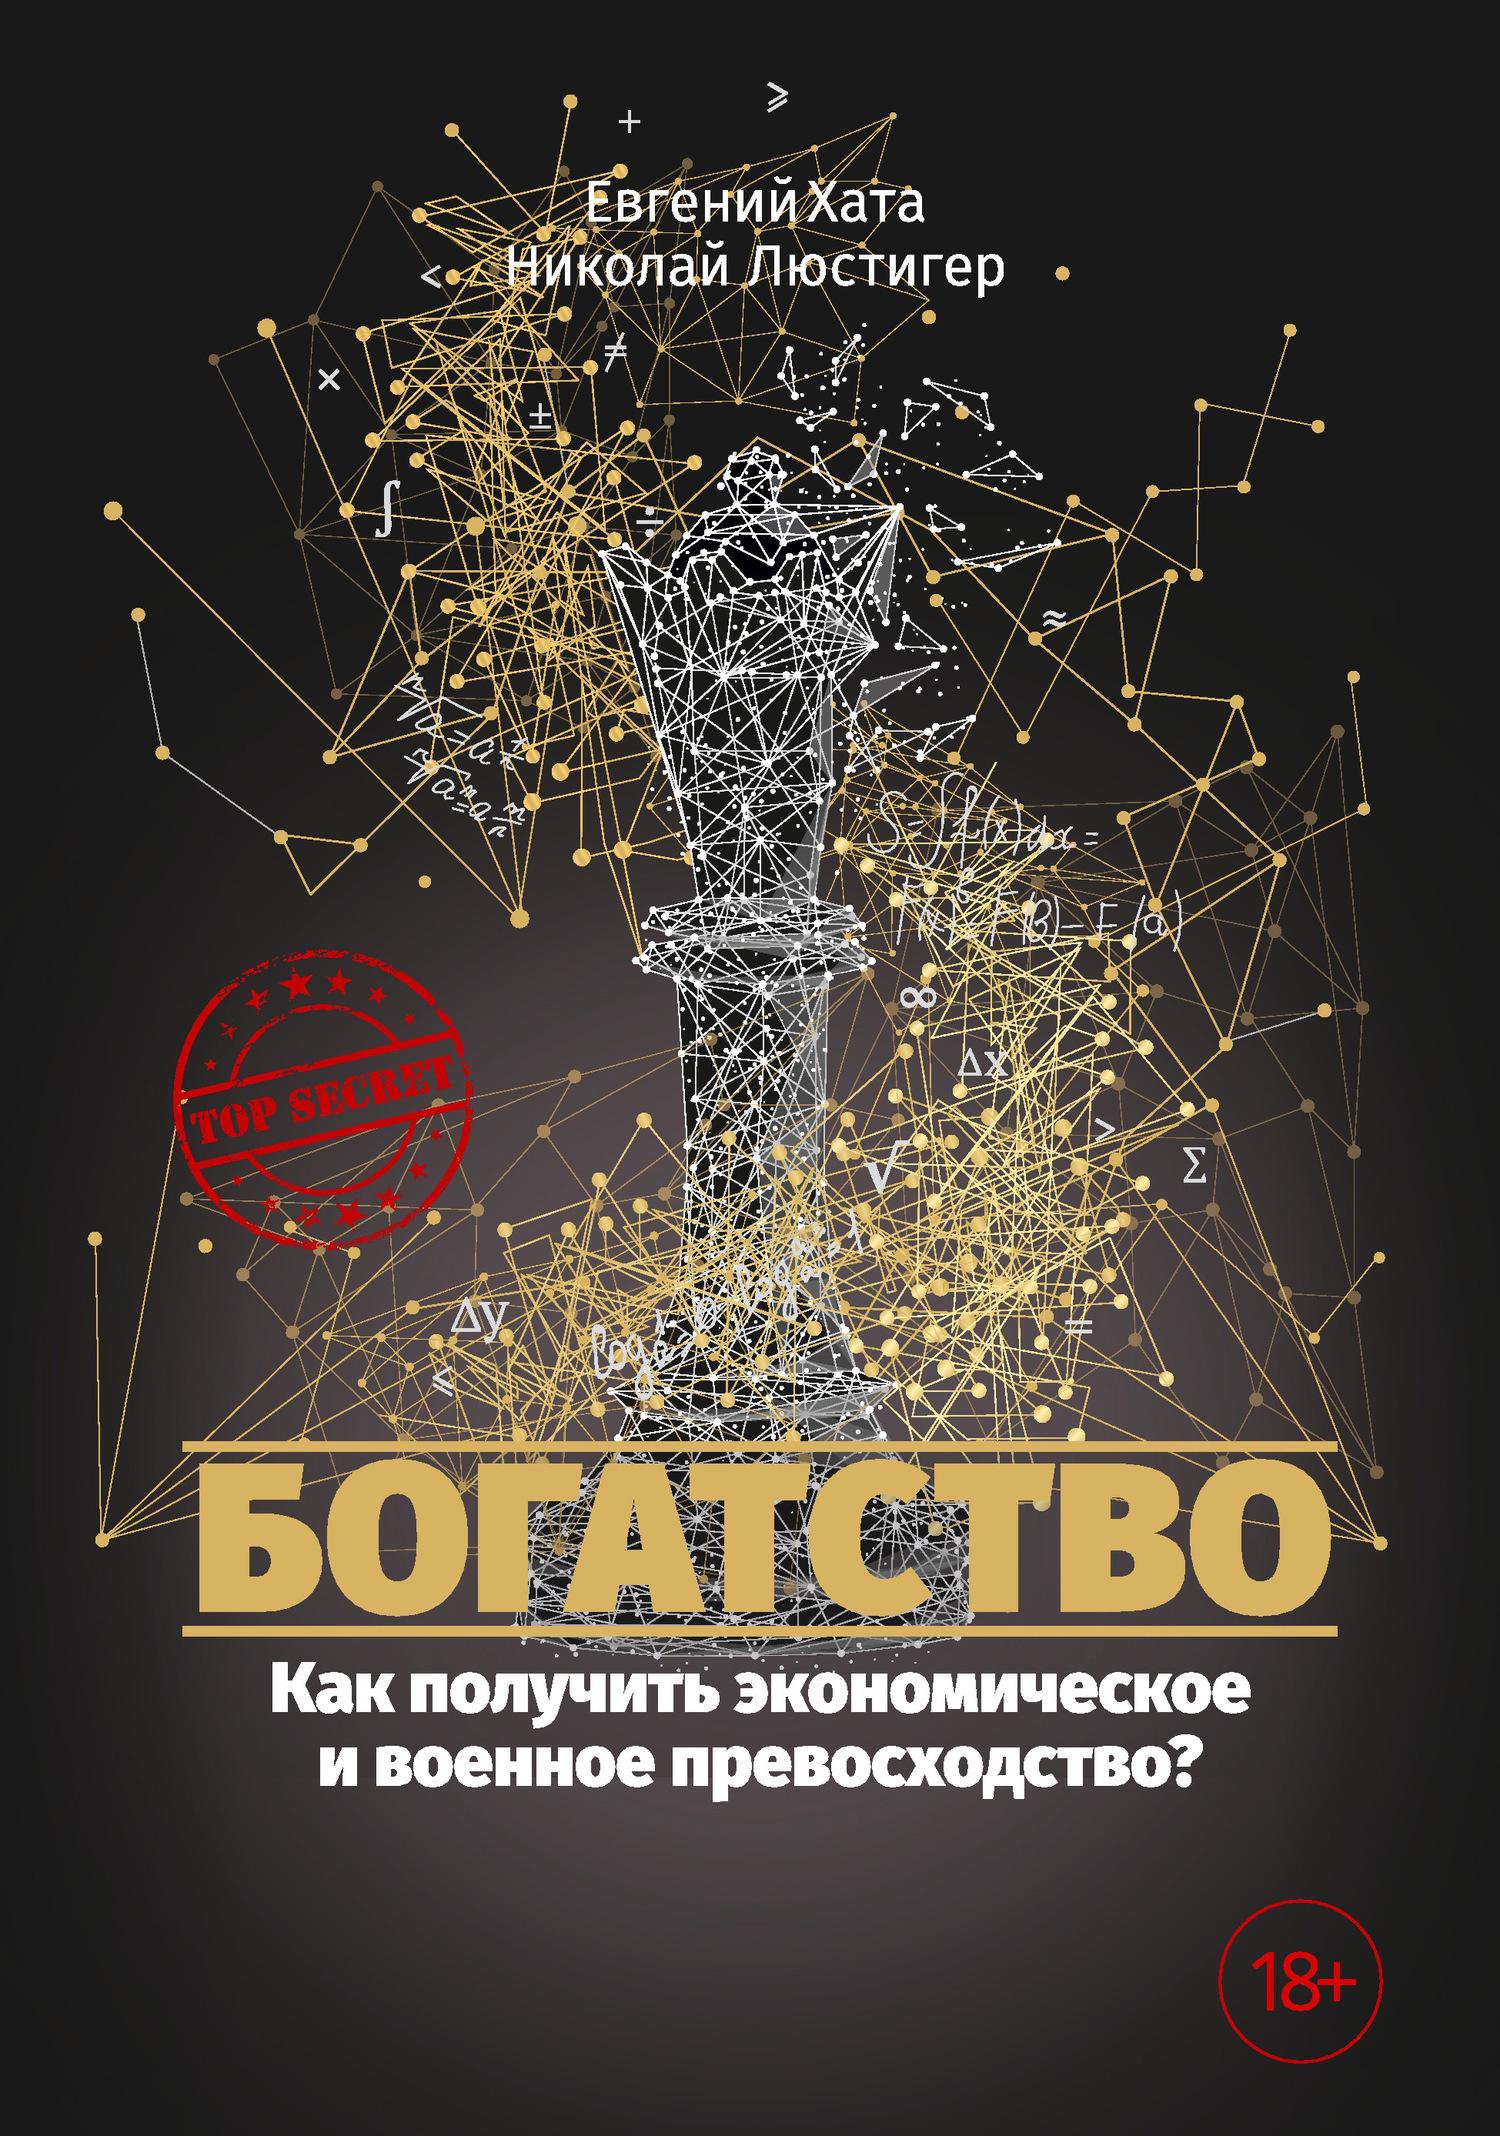 Обложка книги. Автор - Евгений Хата